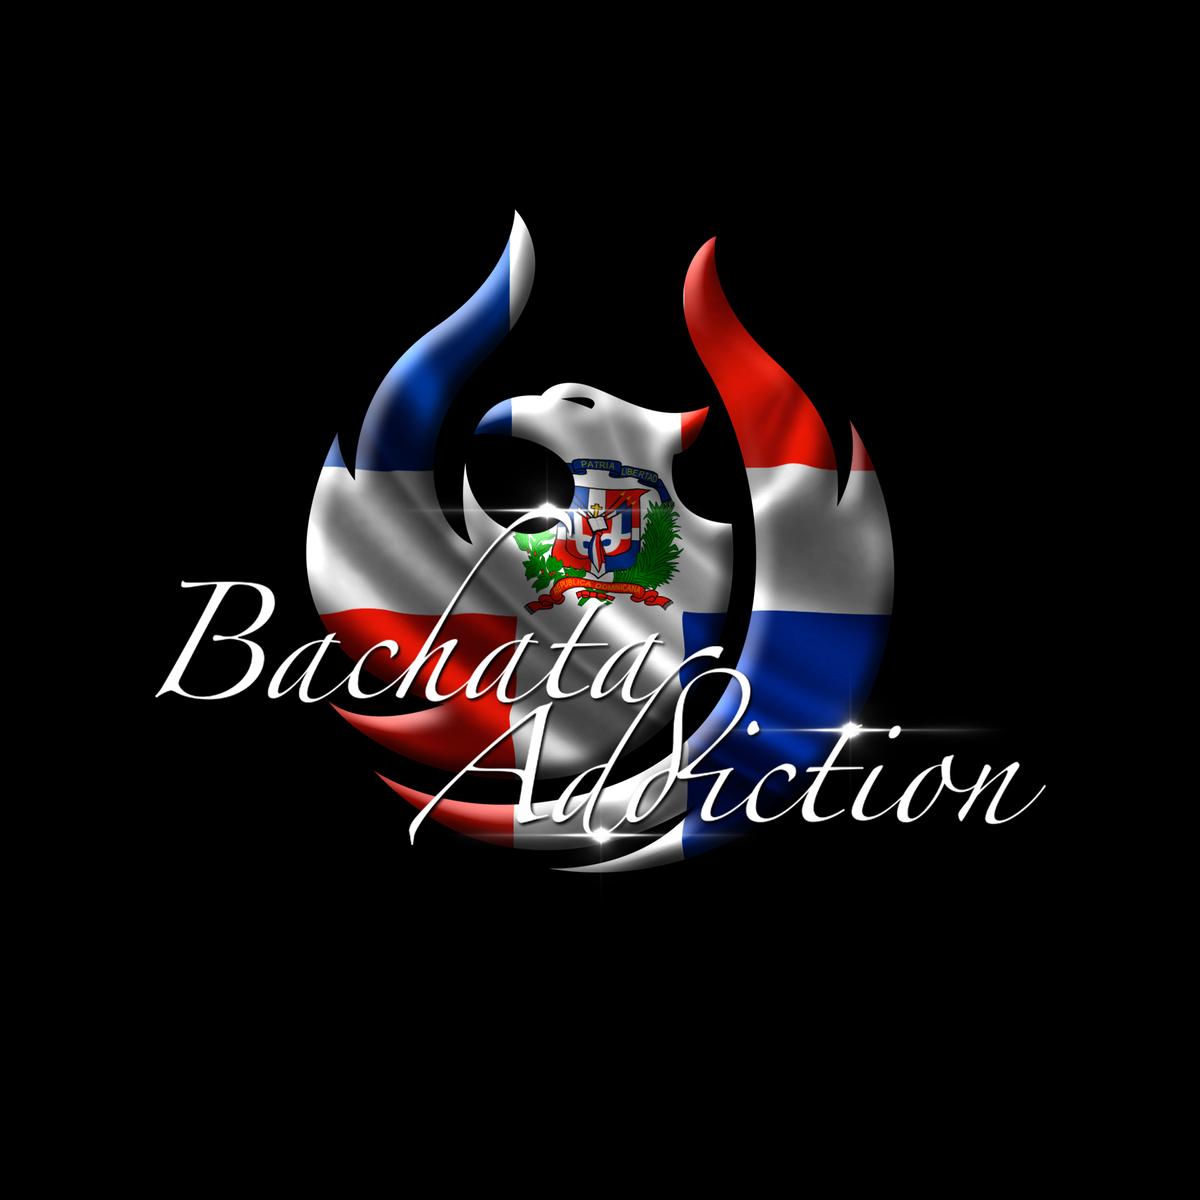 Phoenix Bachata Addiction logo